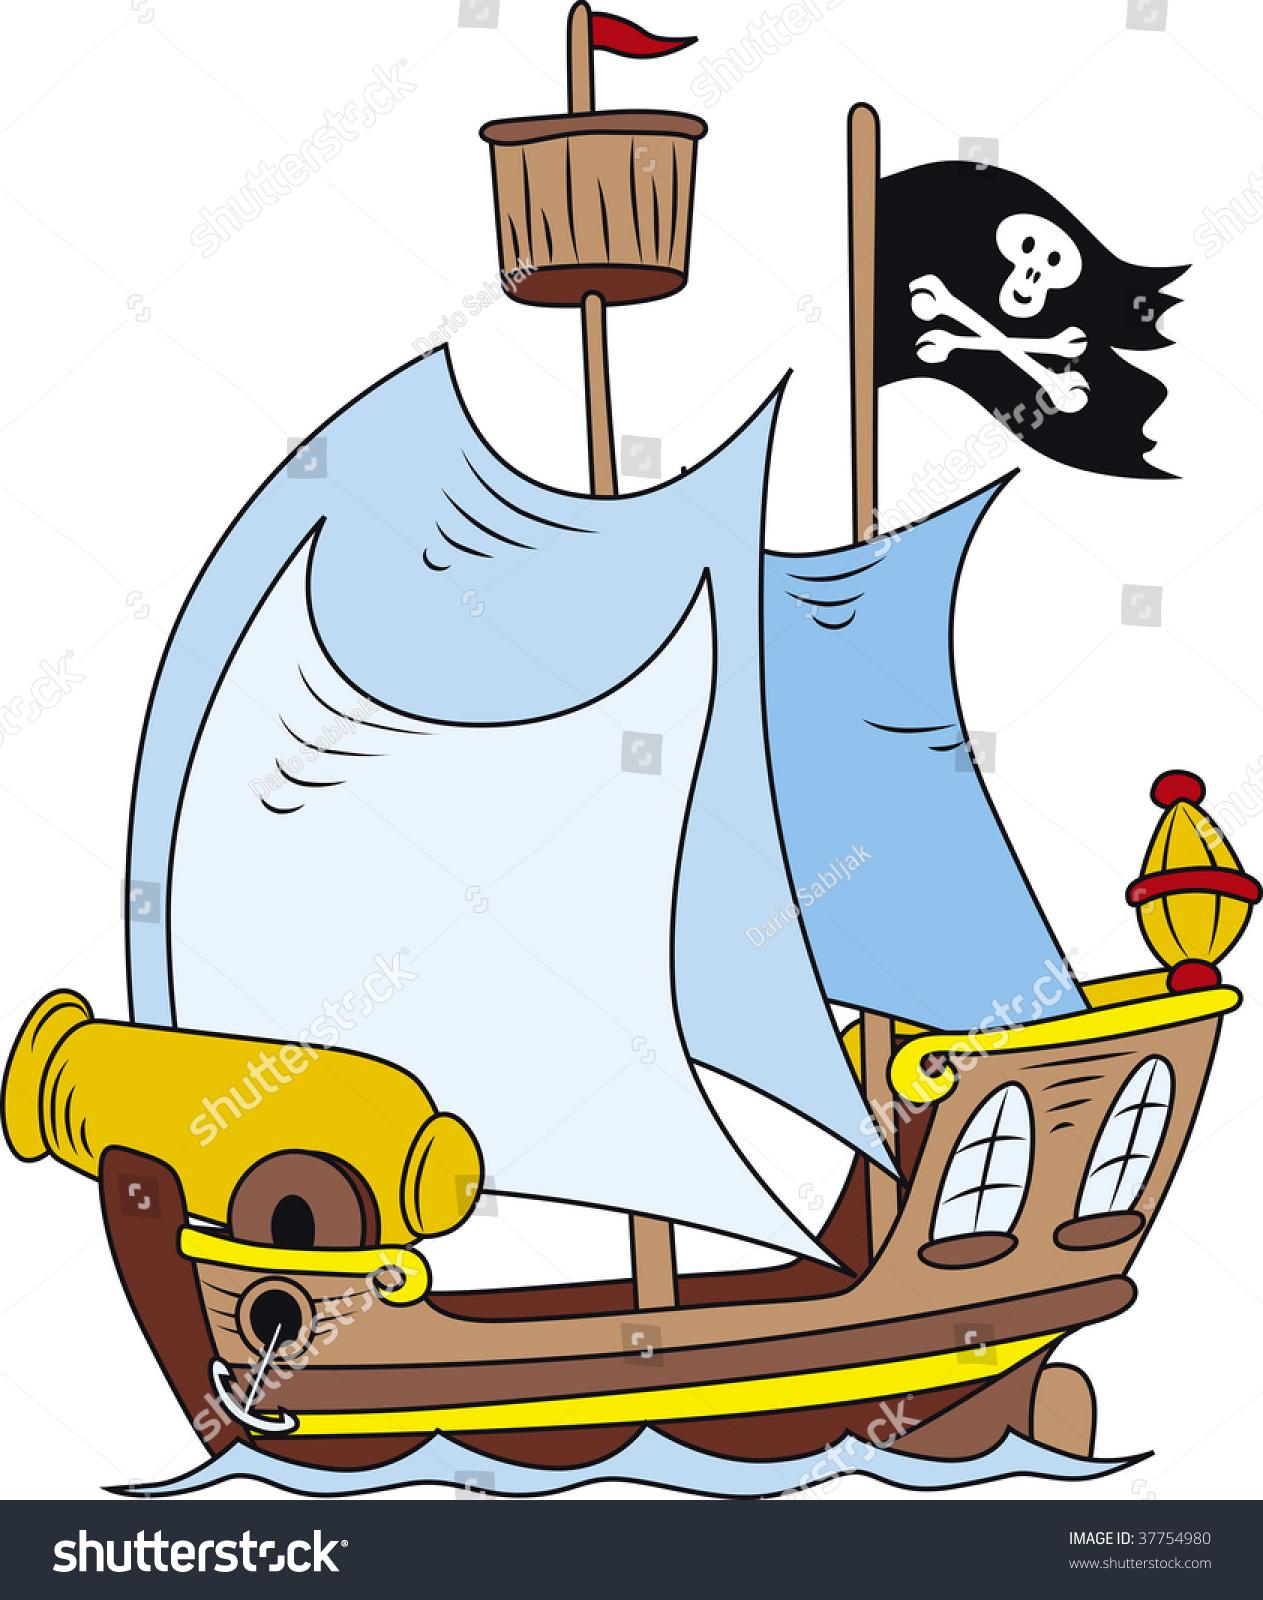 Cartoon Illustration Of Pirate Ship - 37754980 : Shutterstock